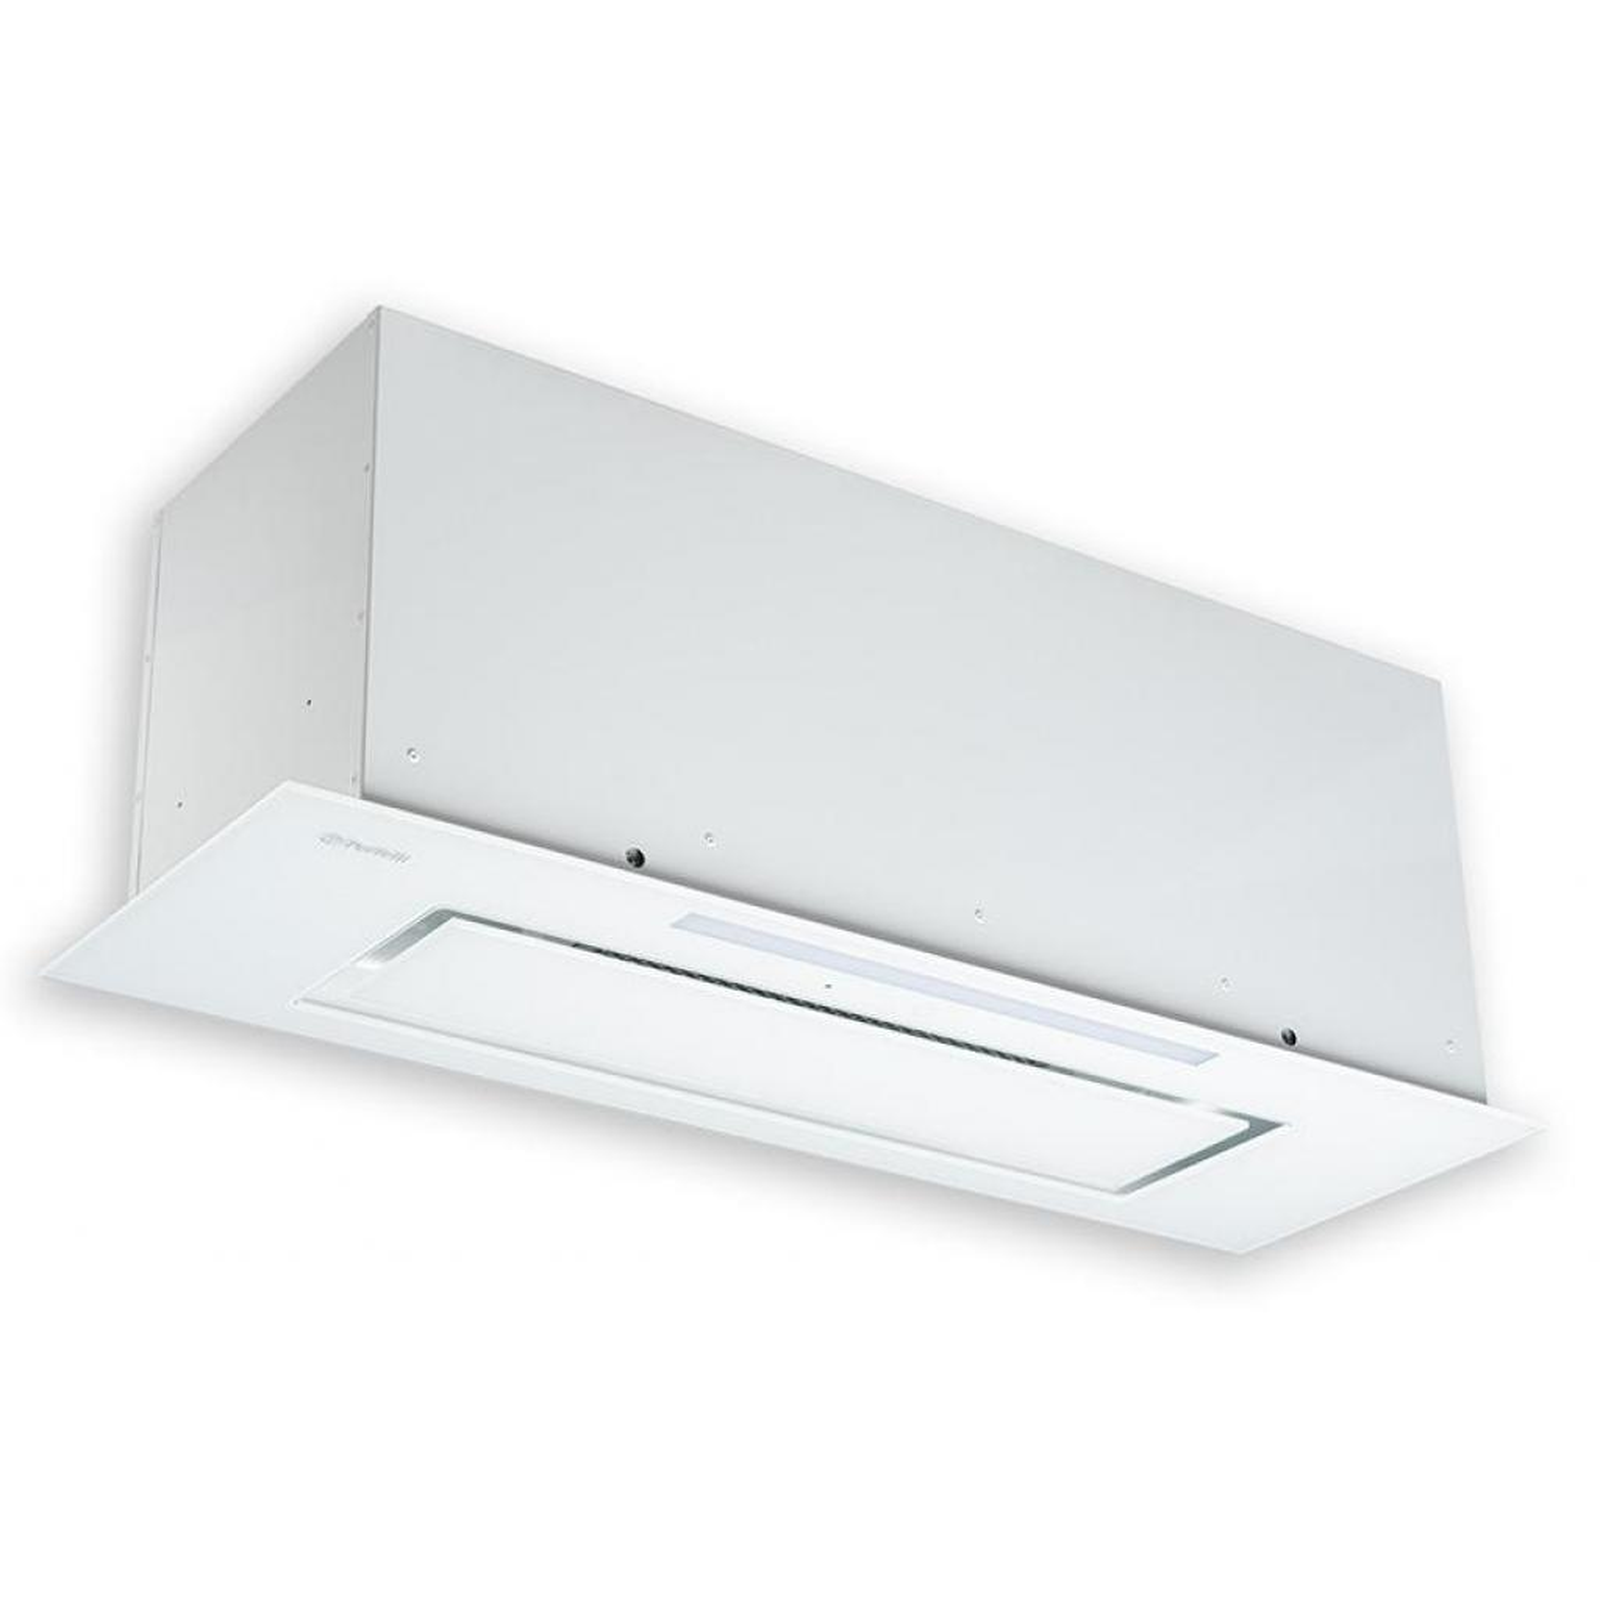 Вытяжка кухонная PERFELLI BISP 9973 A 1250 W LED Strip изображение 2